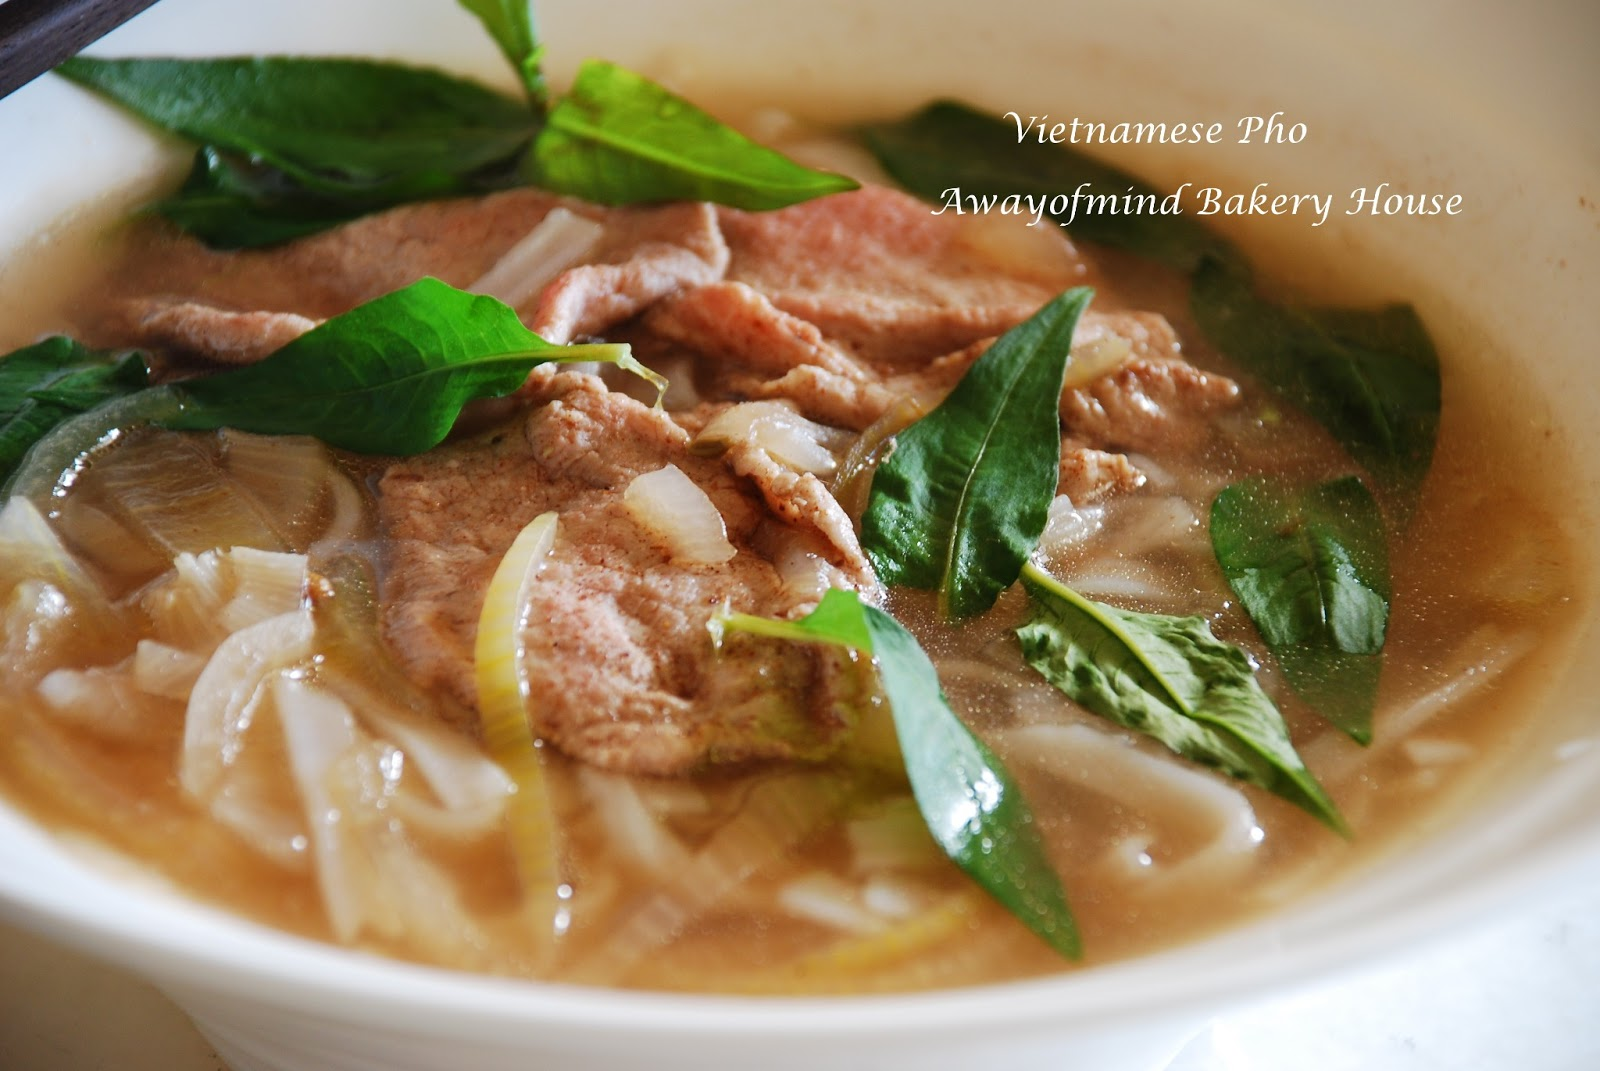 Awayofmind bakery house vietnamese pho beef rice noodles - Vietnamese cuisine pho ...